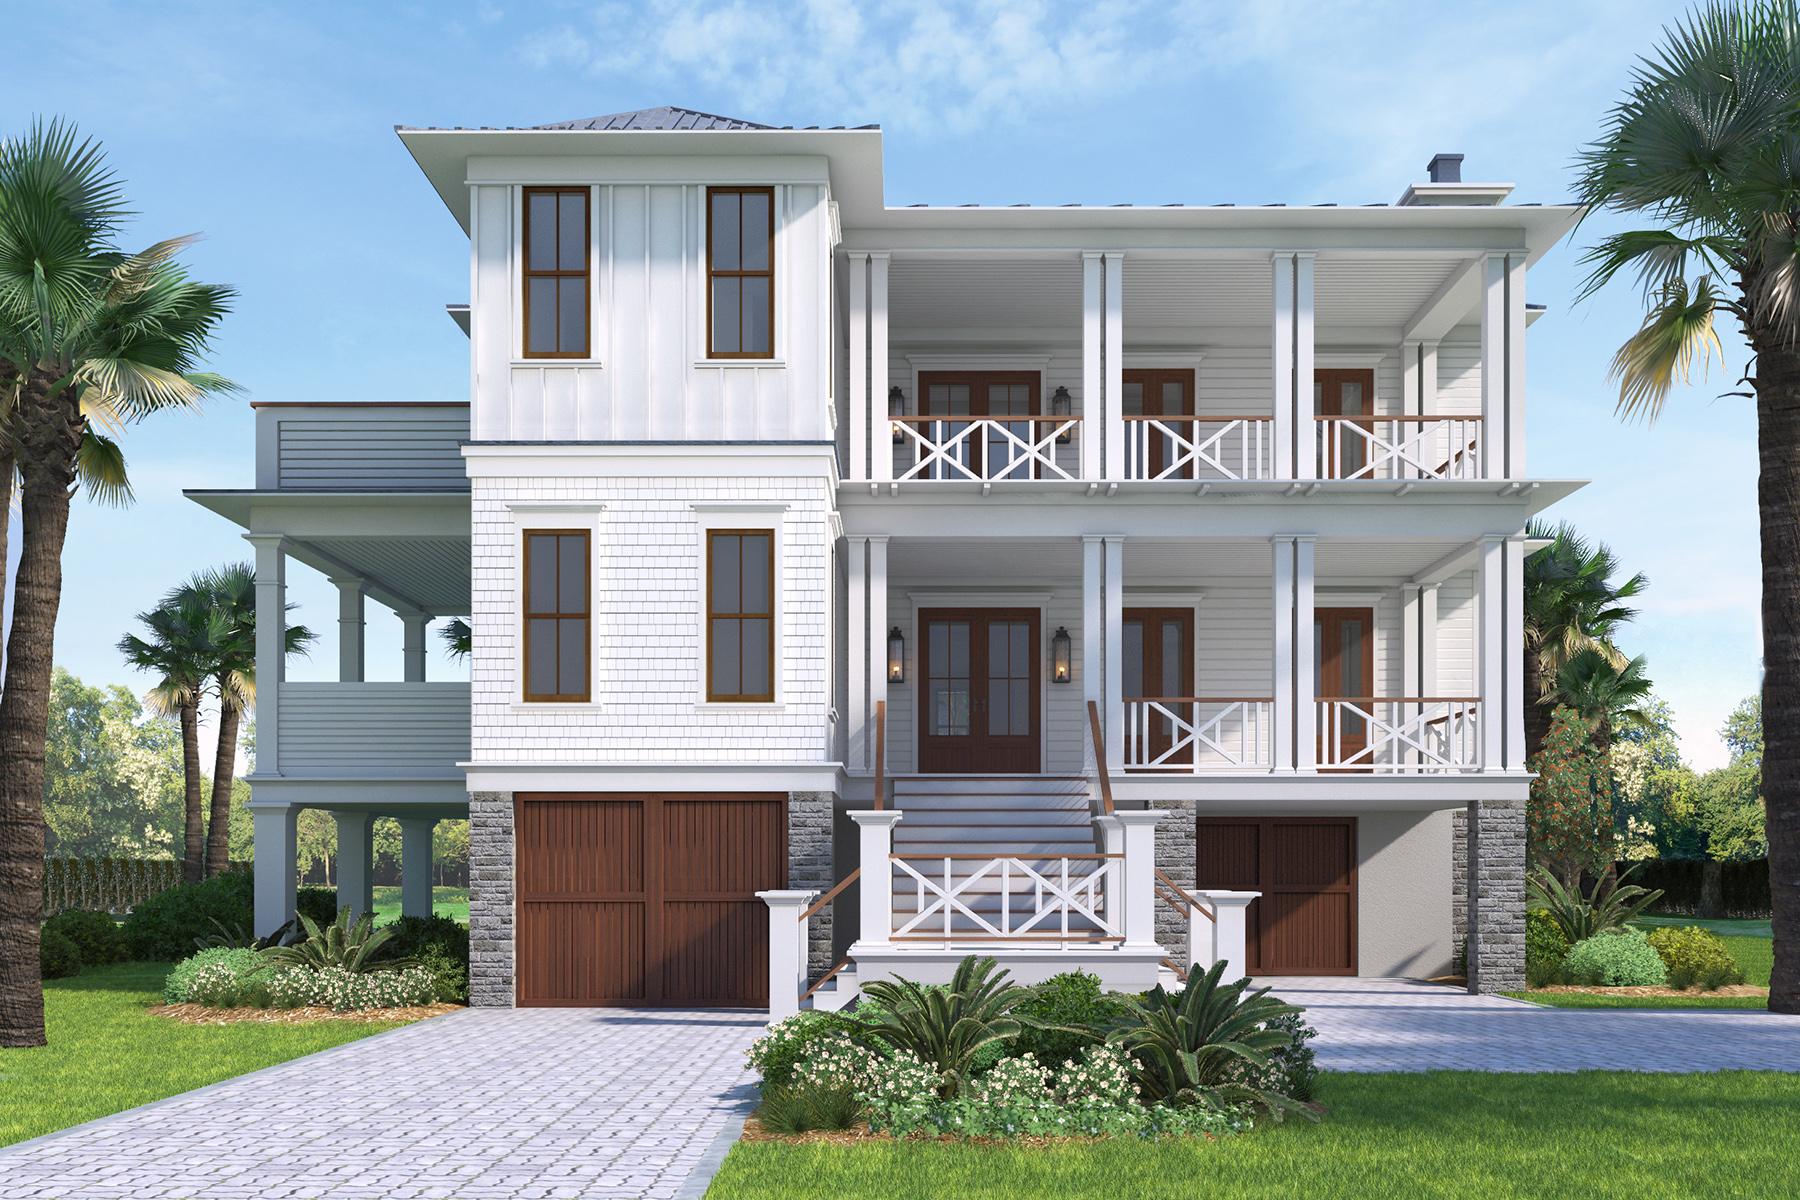 Nhà ở một gia đình vì Bán tại Entertainer's Dream Home on Sullivans Island 1311 Cove Avenue Sullivans Island, Nam Carolina, 29482 Hoa Kỳ